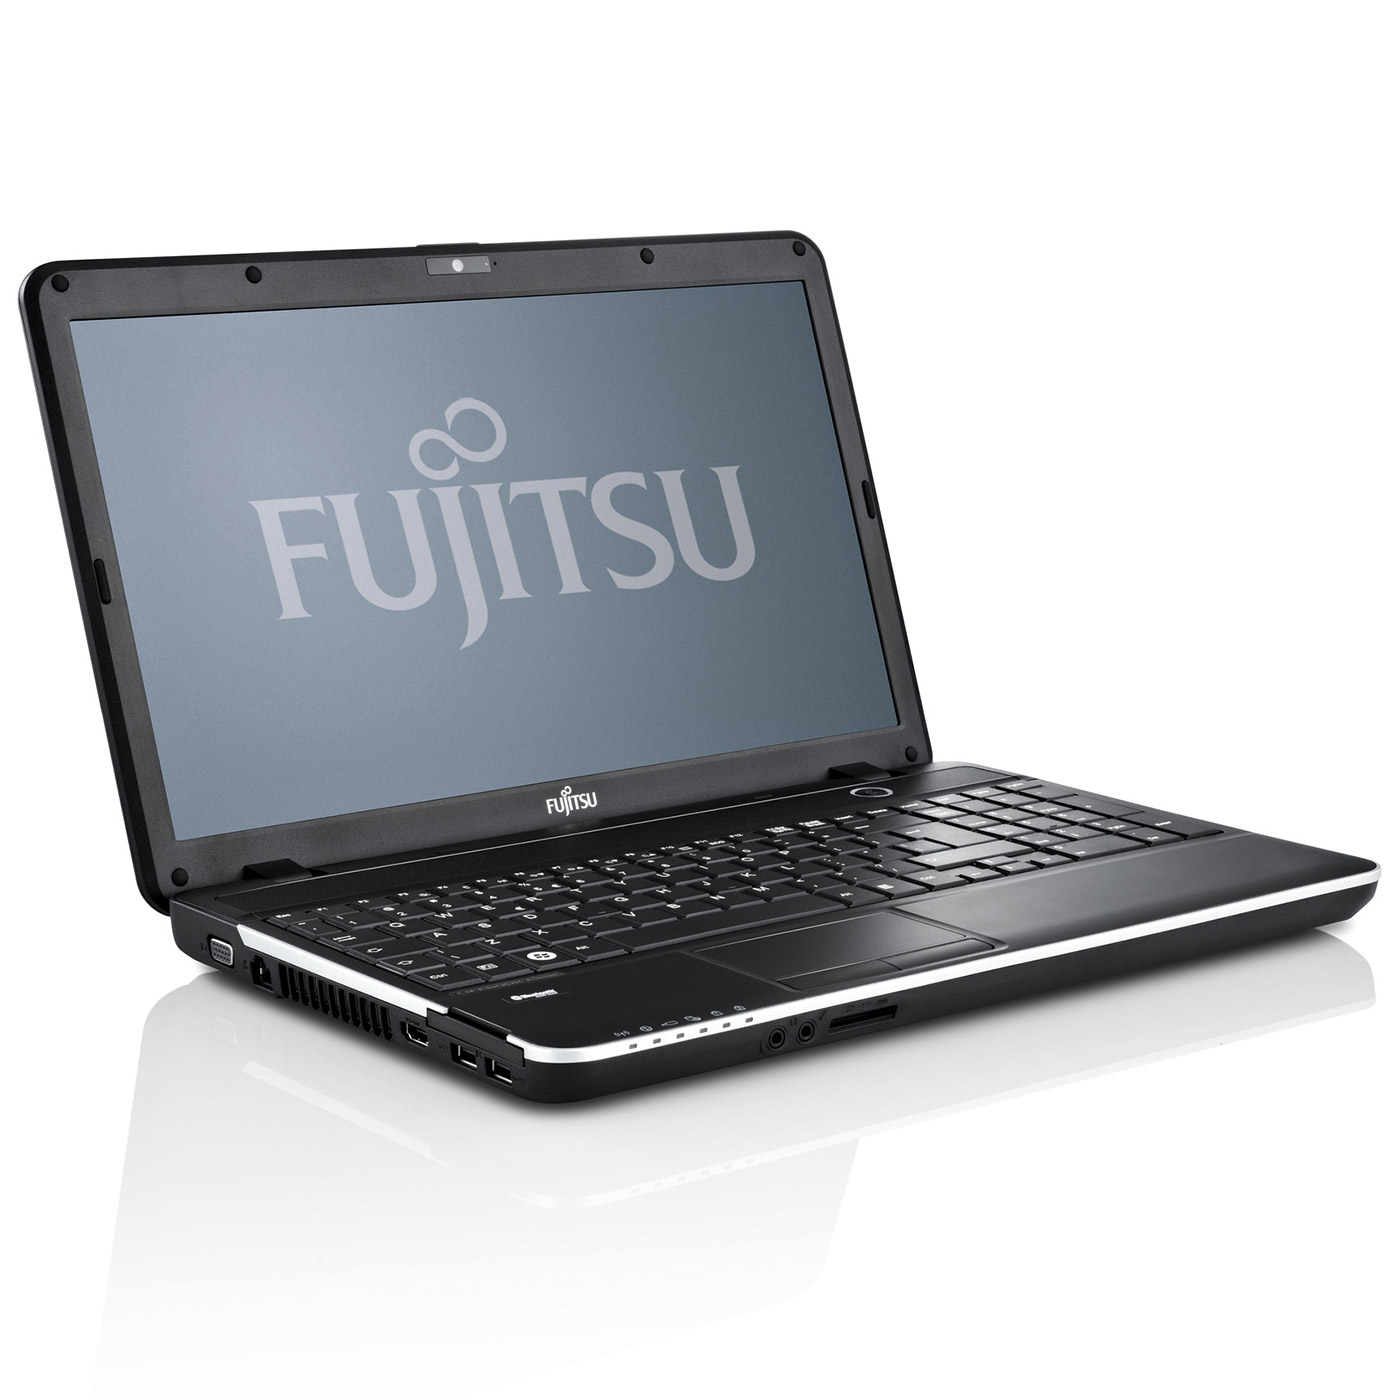 fujitsu ordinateur